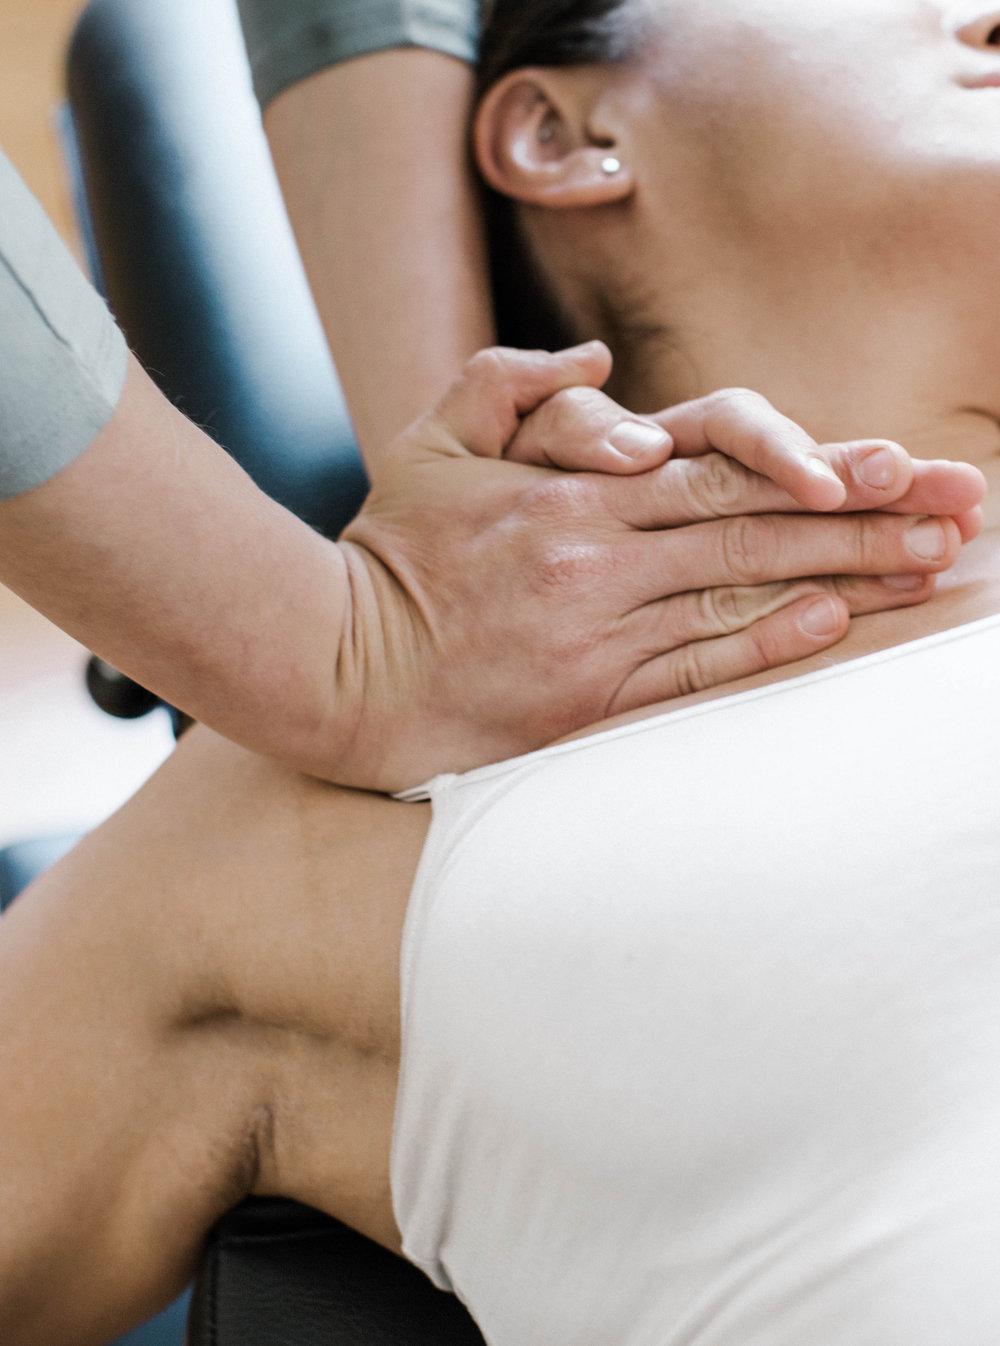 car-accident-injury-chiropractor